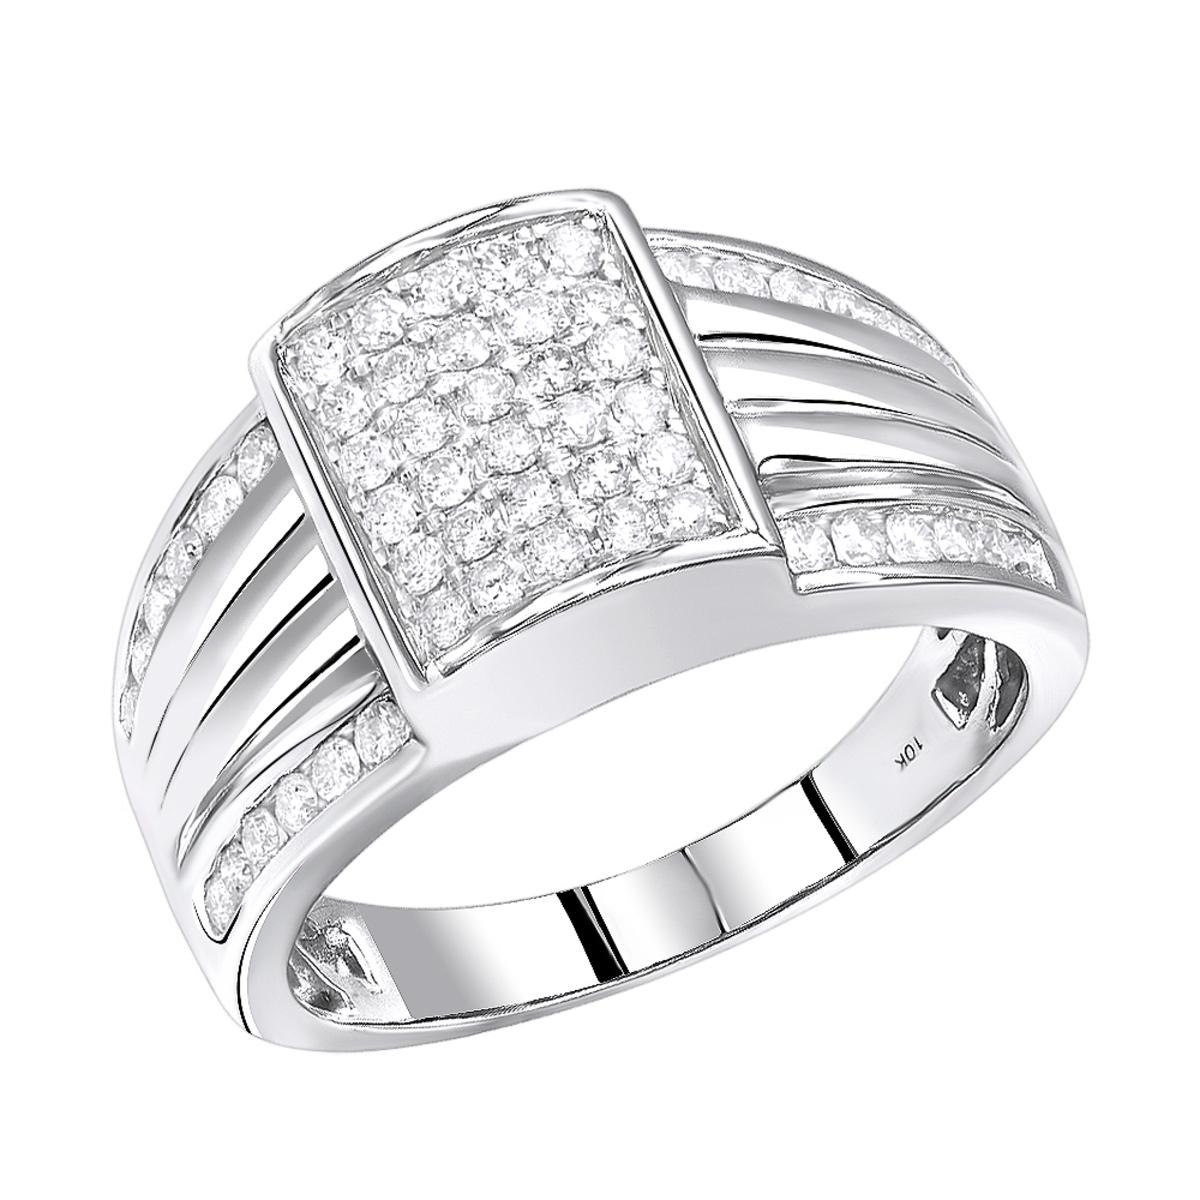 10K Gold  Mens Diamond Pinky Ring 1 Carat by Luxurman